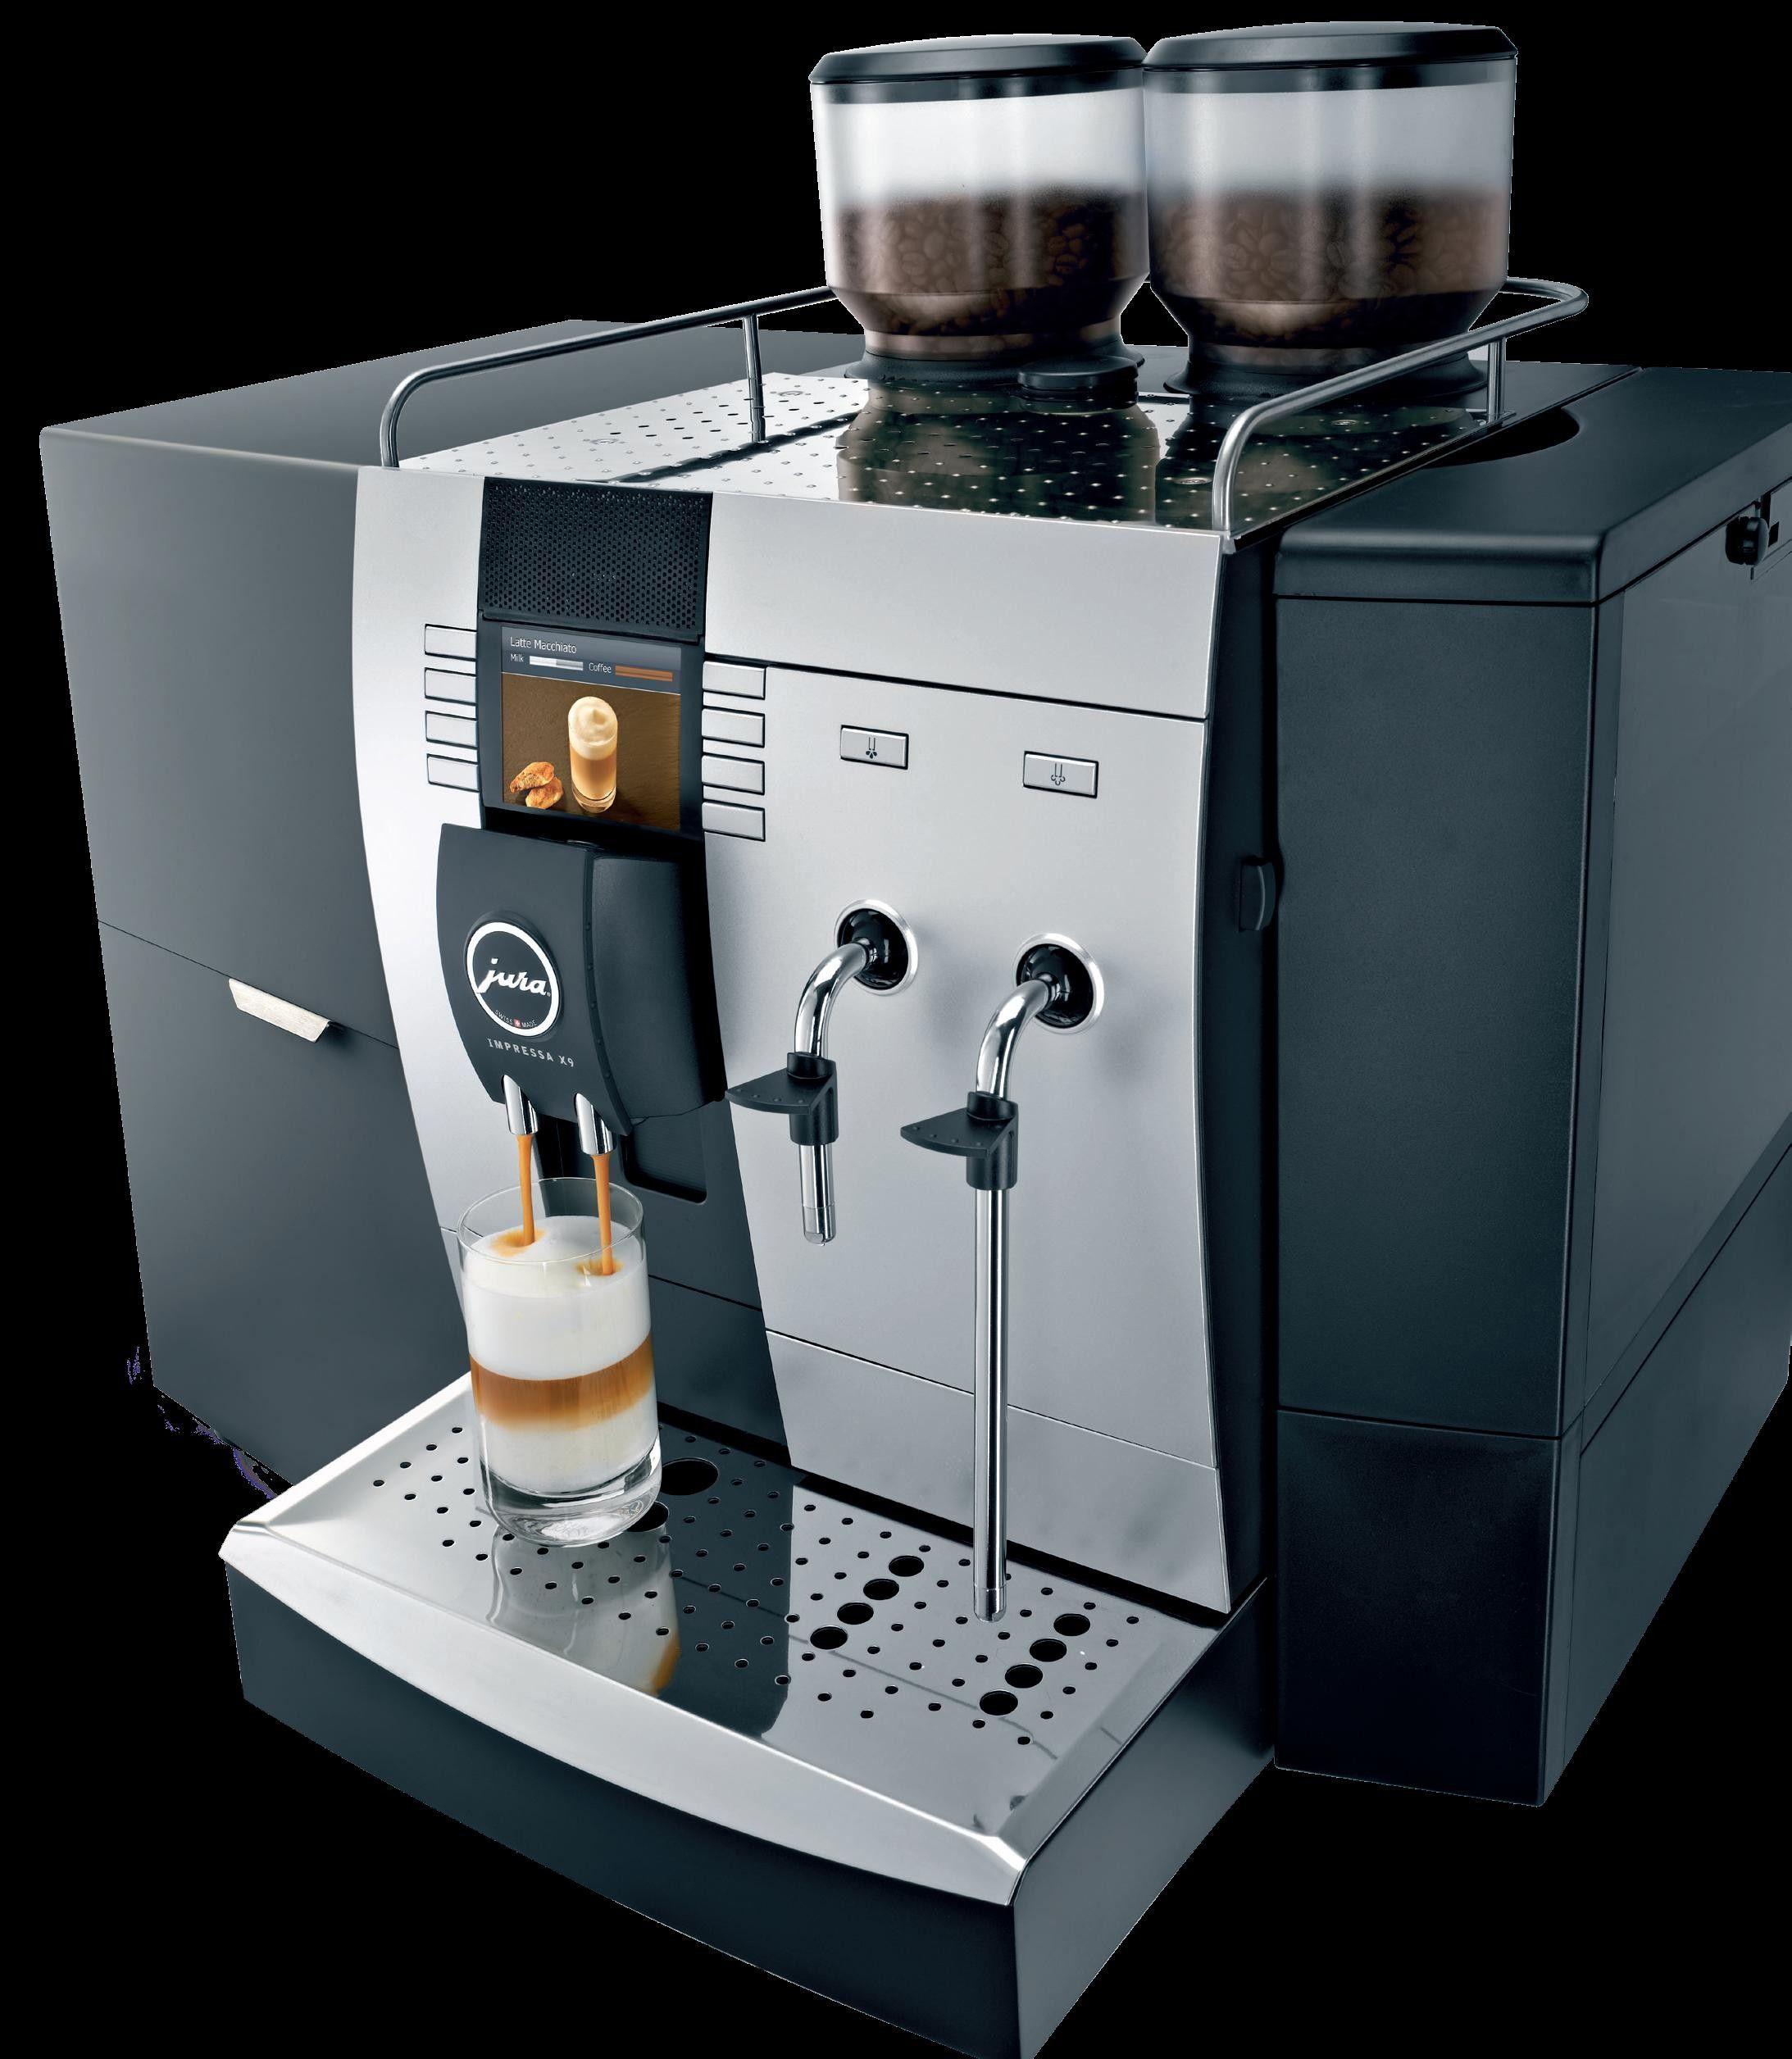 Jura X9 Generation 2 Coffee Machine Commercial coffee